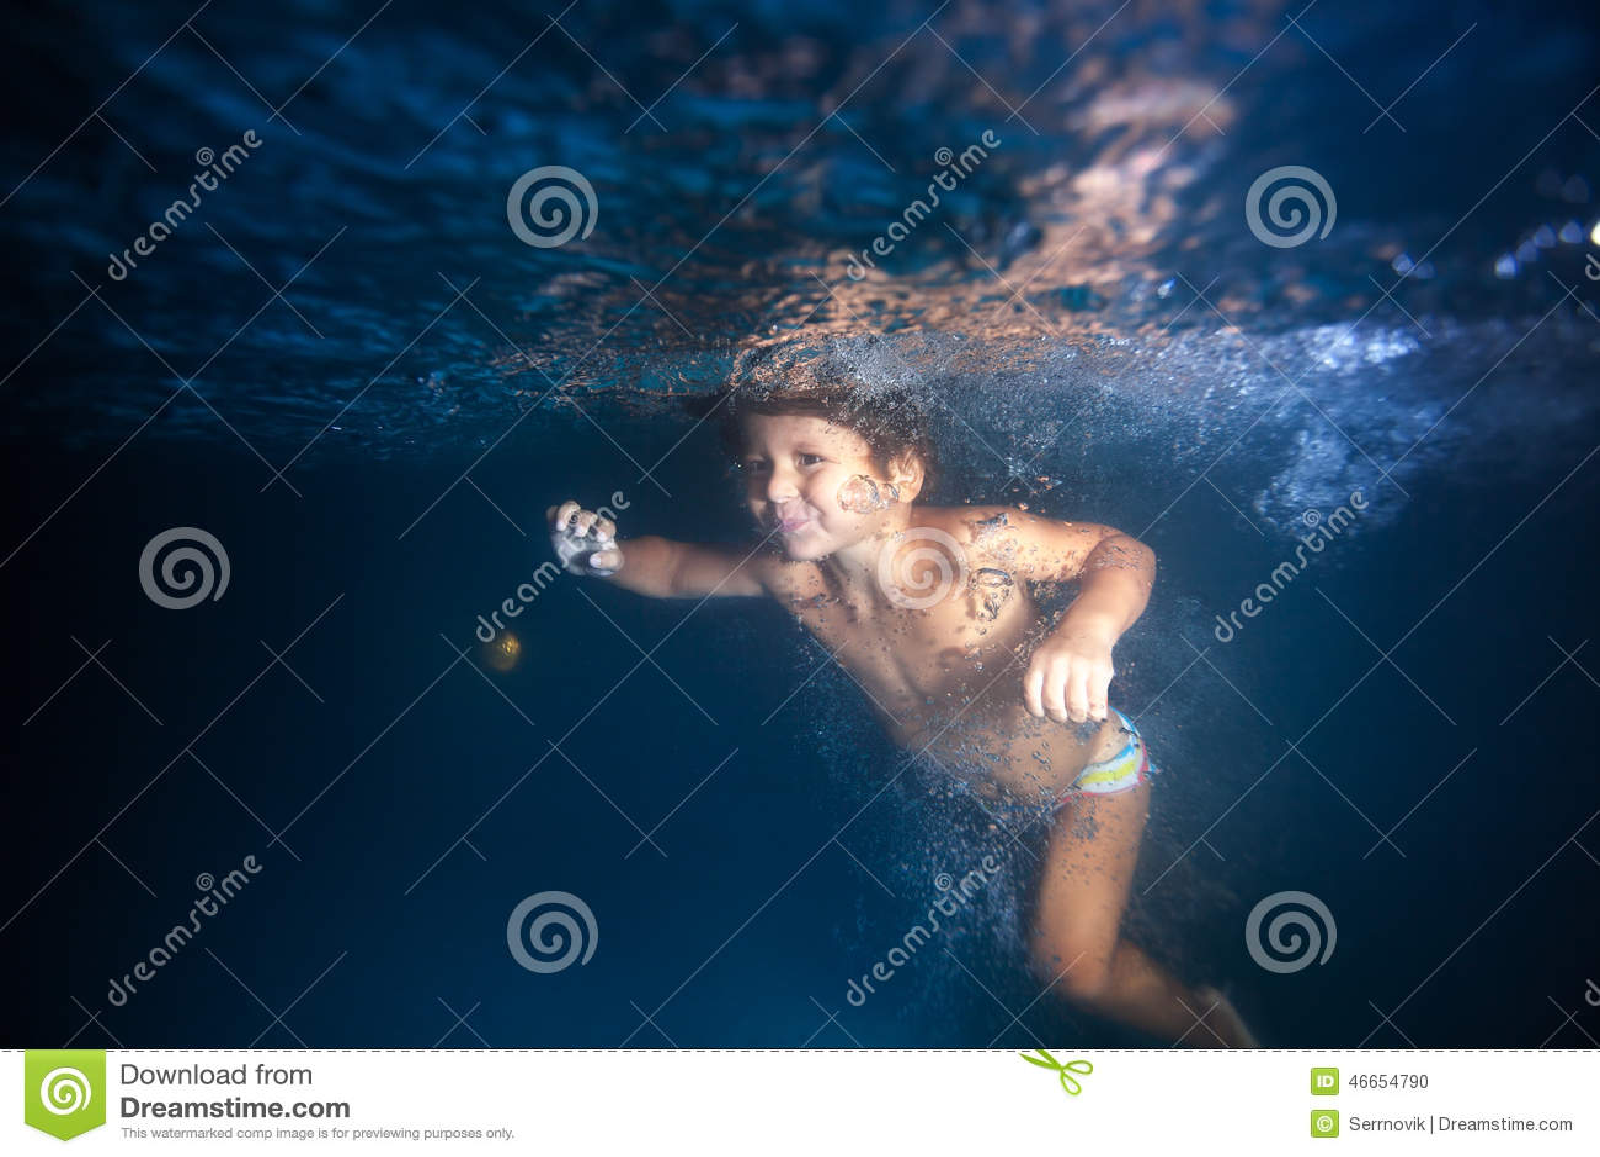 pool water at night. Download Comp Pool Water At Night \